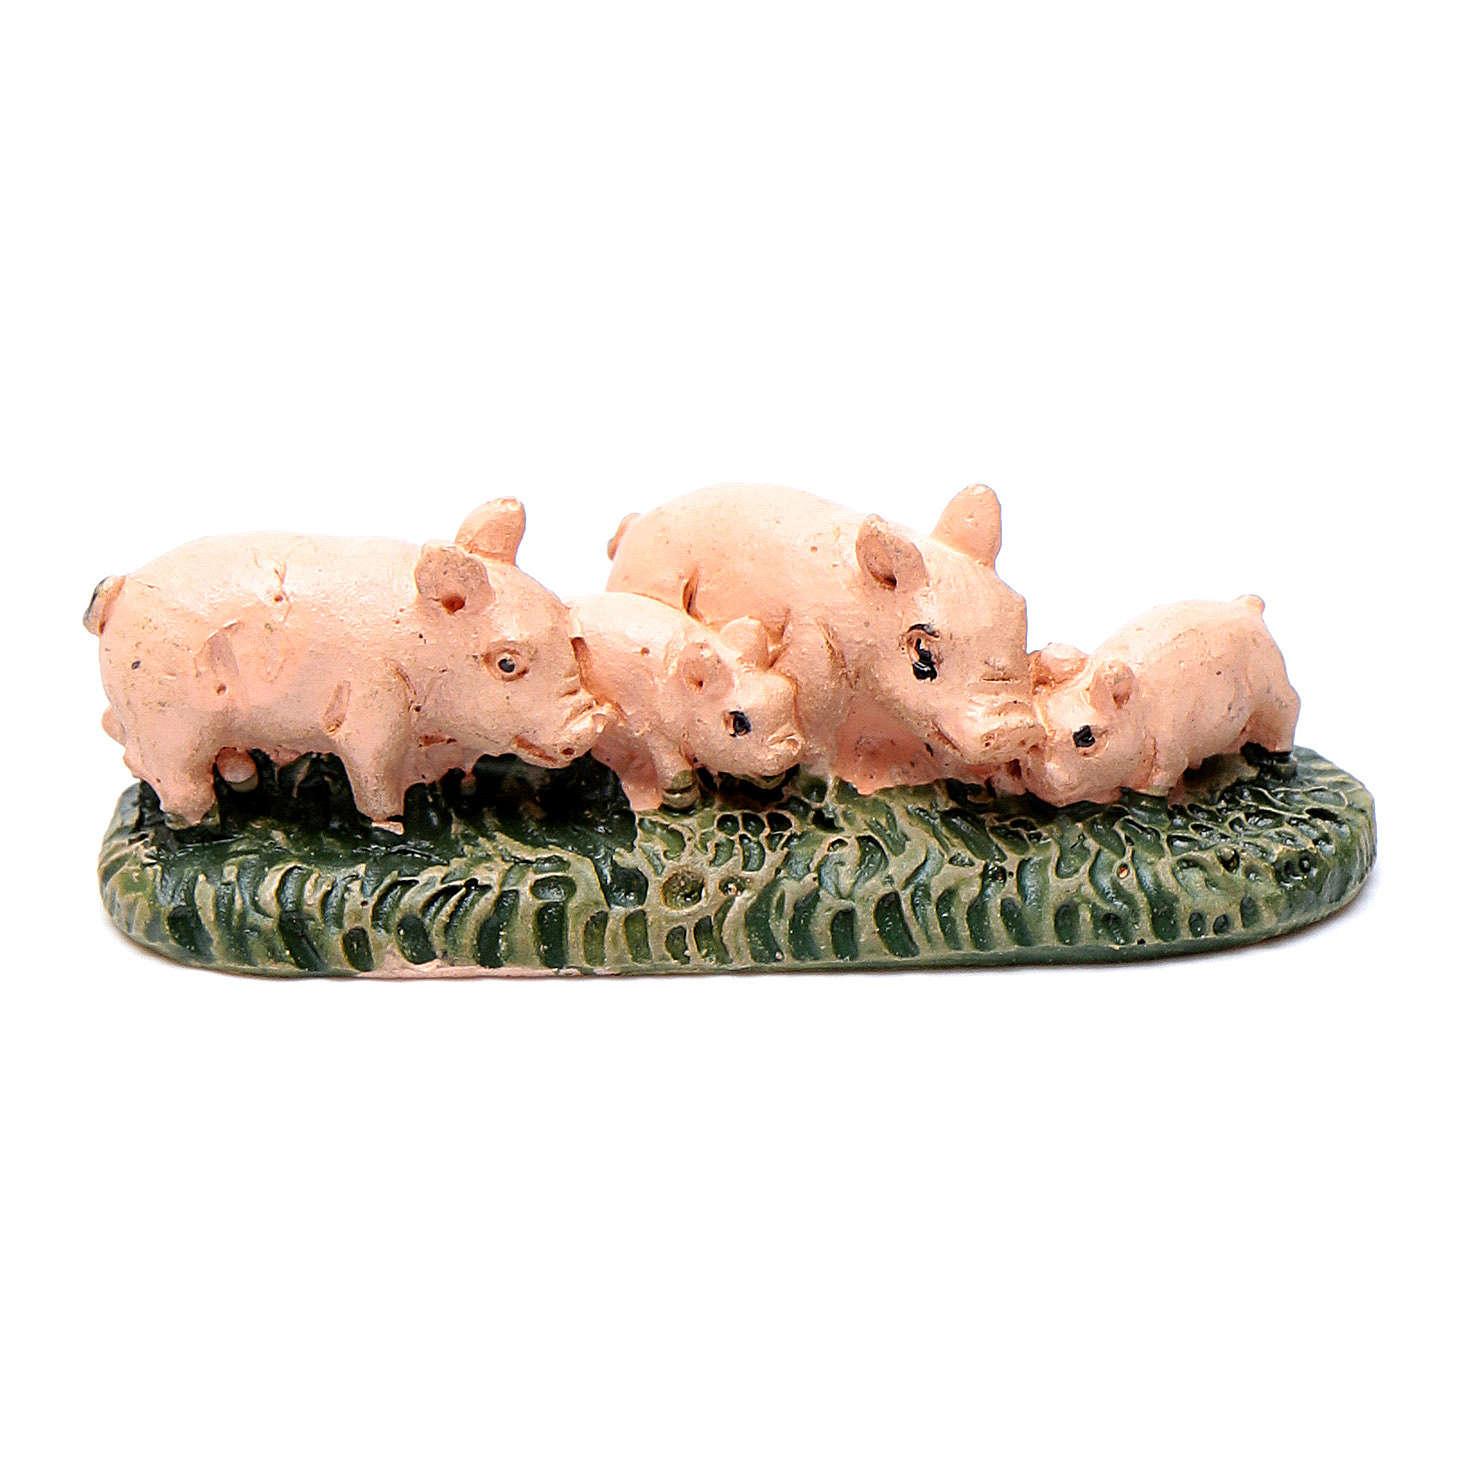 Piggies on grass for 6 cm crib 3